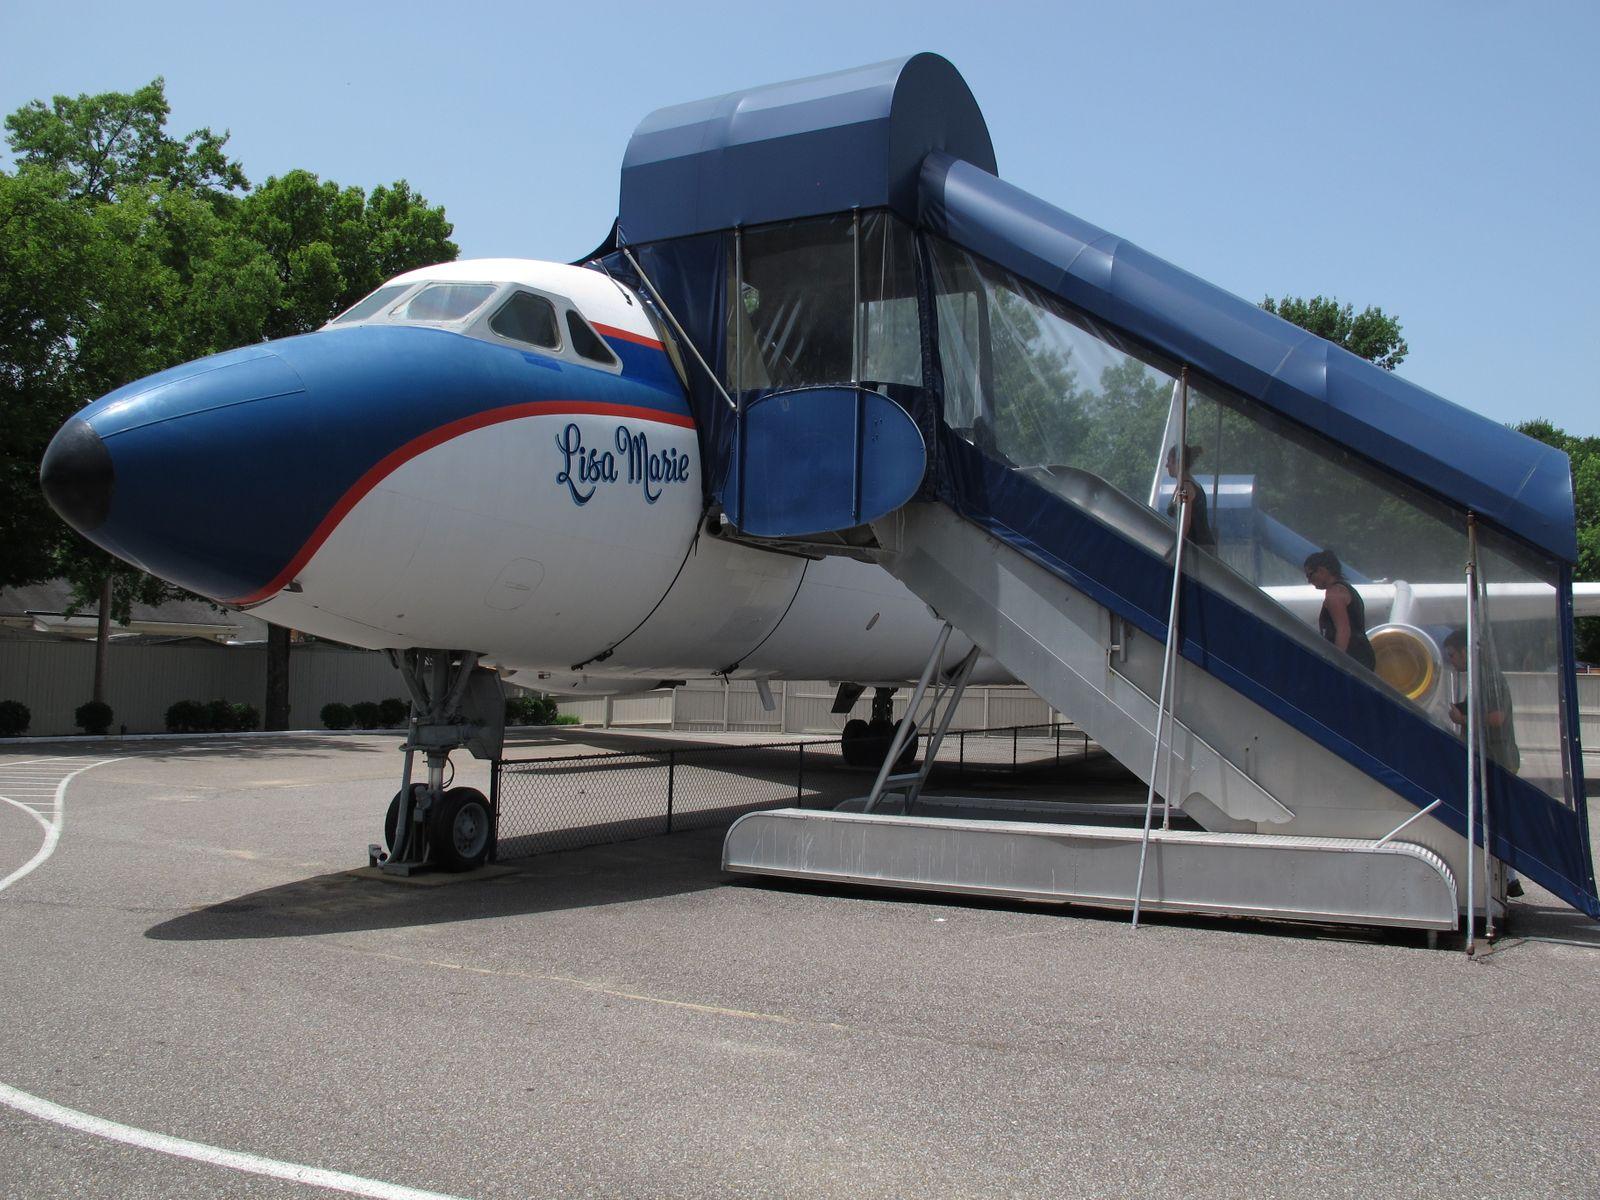 Elvis Presley - Graceland Planes